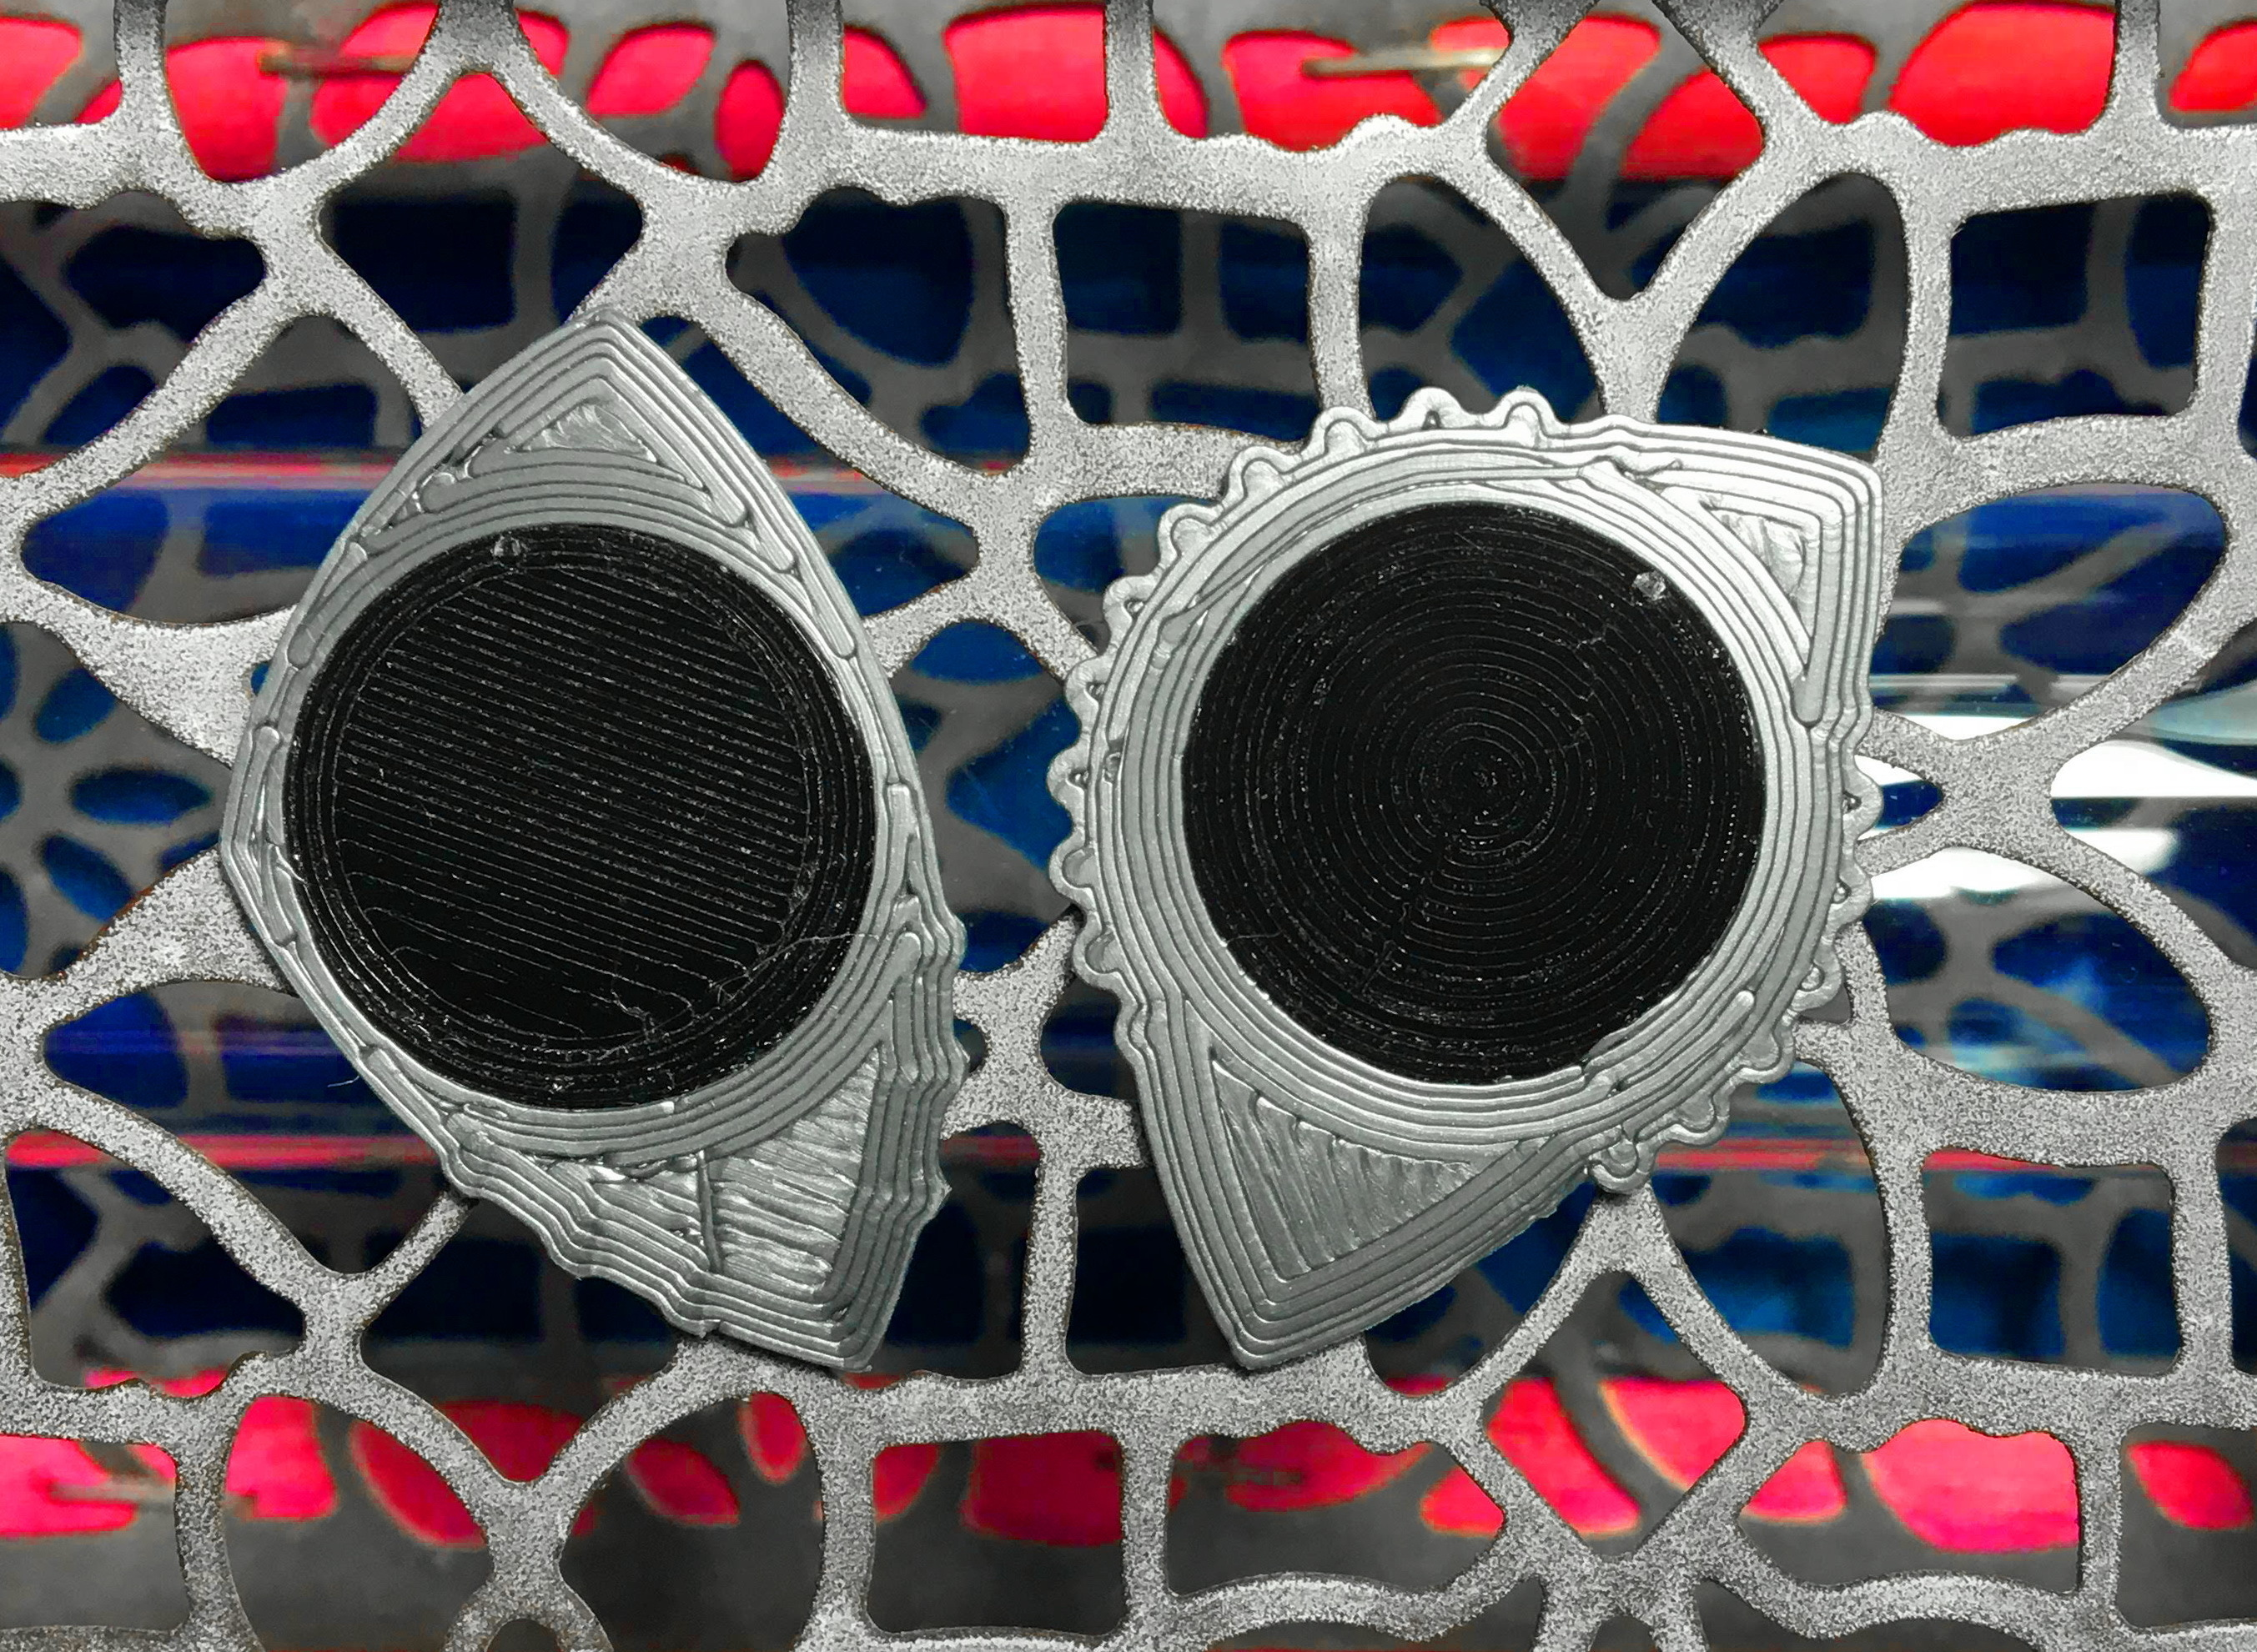 PITA-DENT Y RADOM-PITA 18-Abril-2020 by eXiMienTa.JPG Download free 3MF file PITA-DENT AND RADOM-PITA guitar pick • 3D printable object, carleslluisar